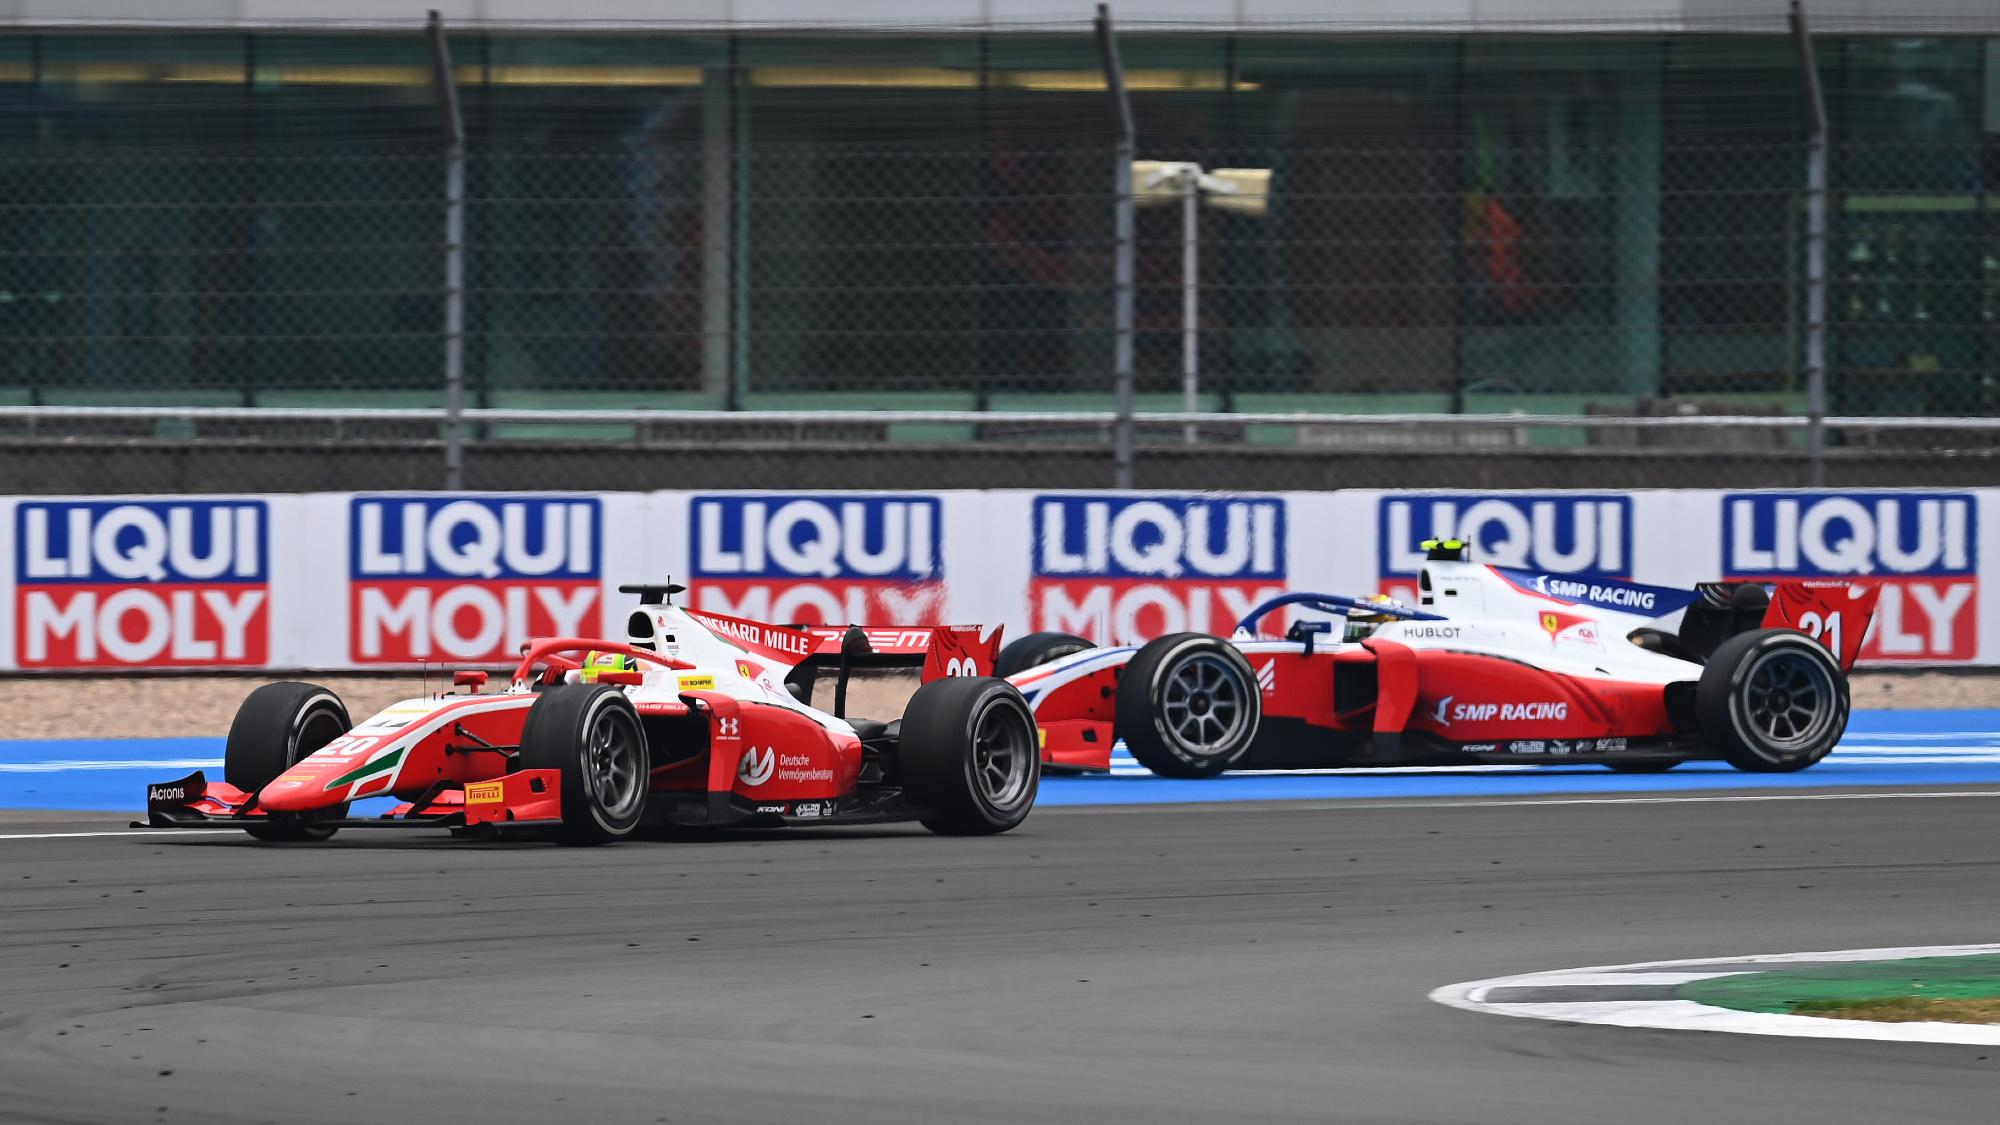 Mick Schumacher, Robert Shwartzman, 2020 F2 Silverstone Sprint Race